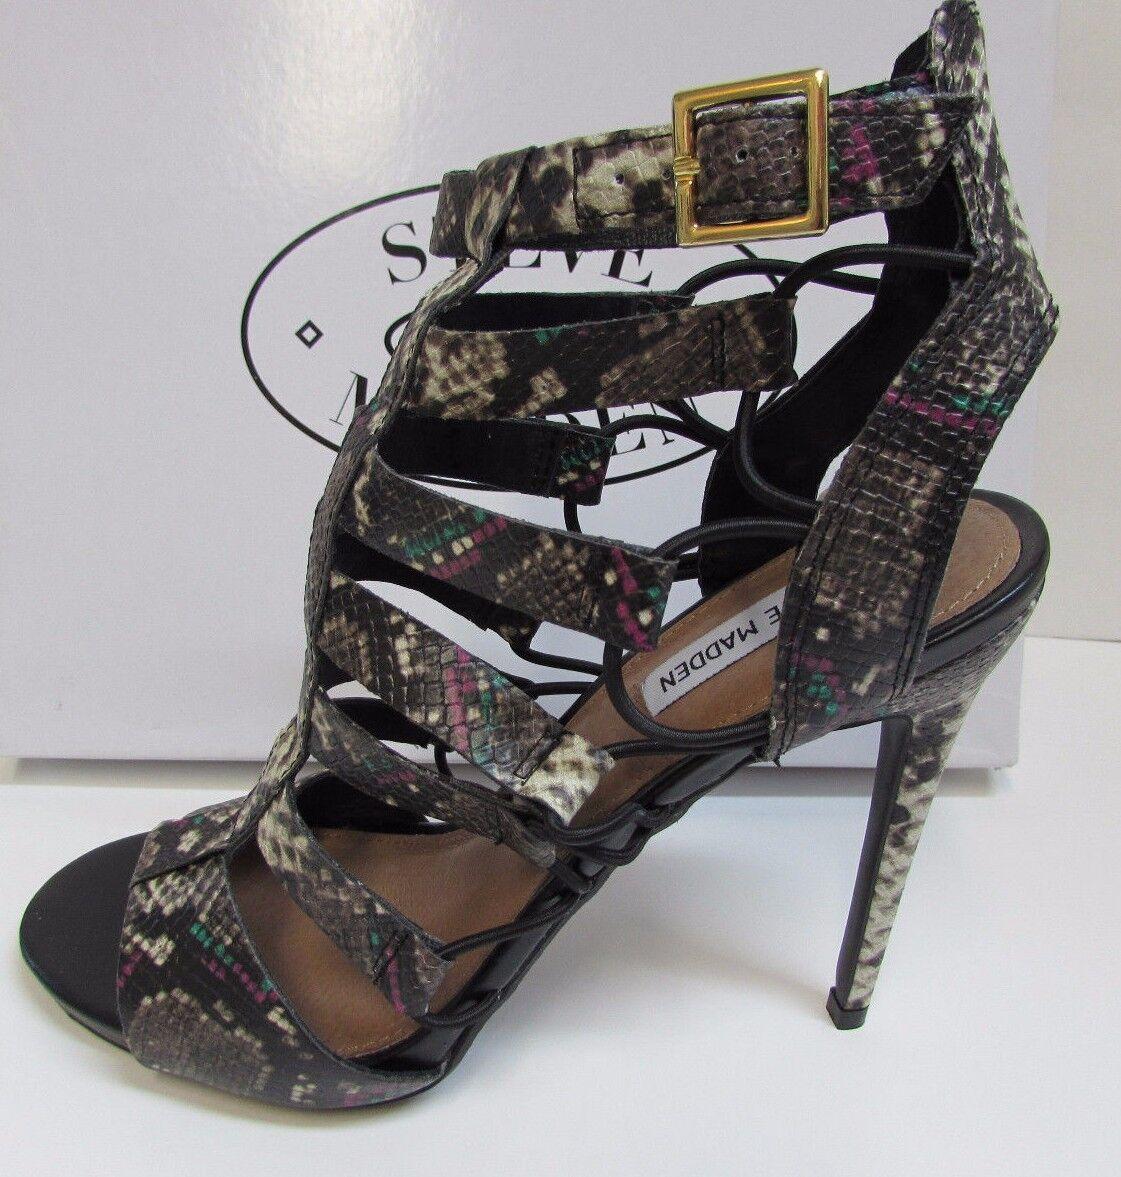 Steve Madden Size 7.5  Snake Heels  New Womens shoes